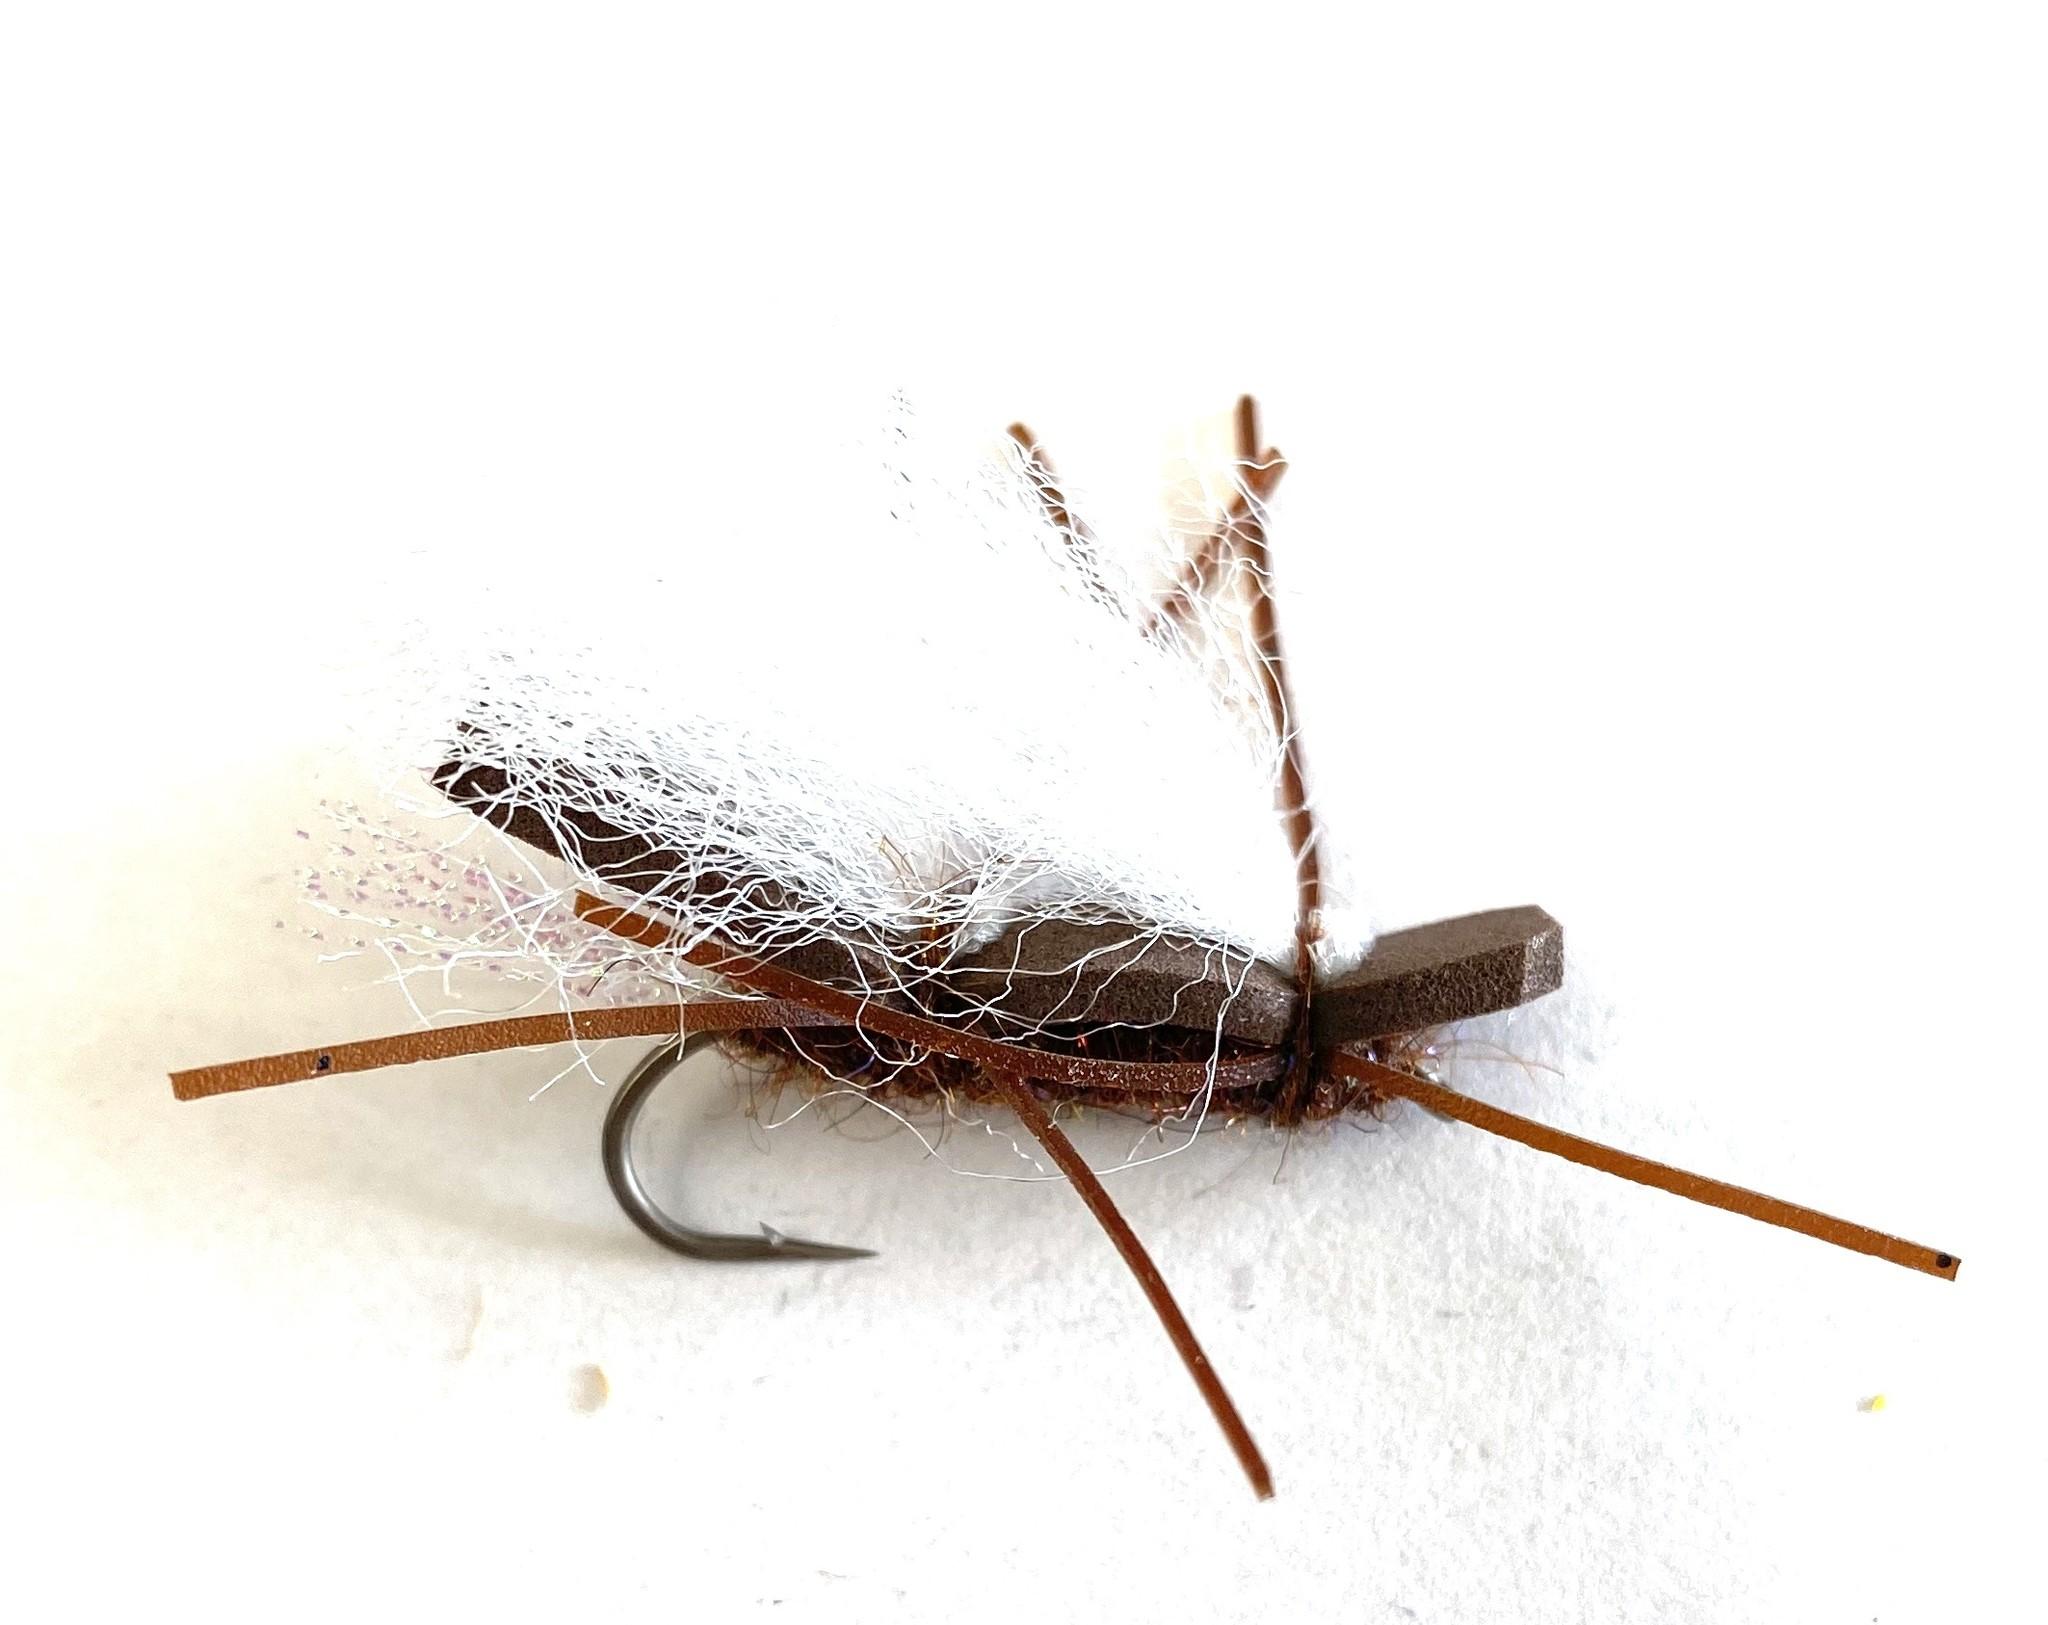 Chubby Chernobyl Salmon Fly Gray Wing